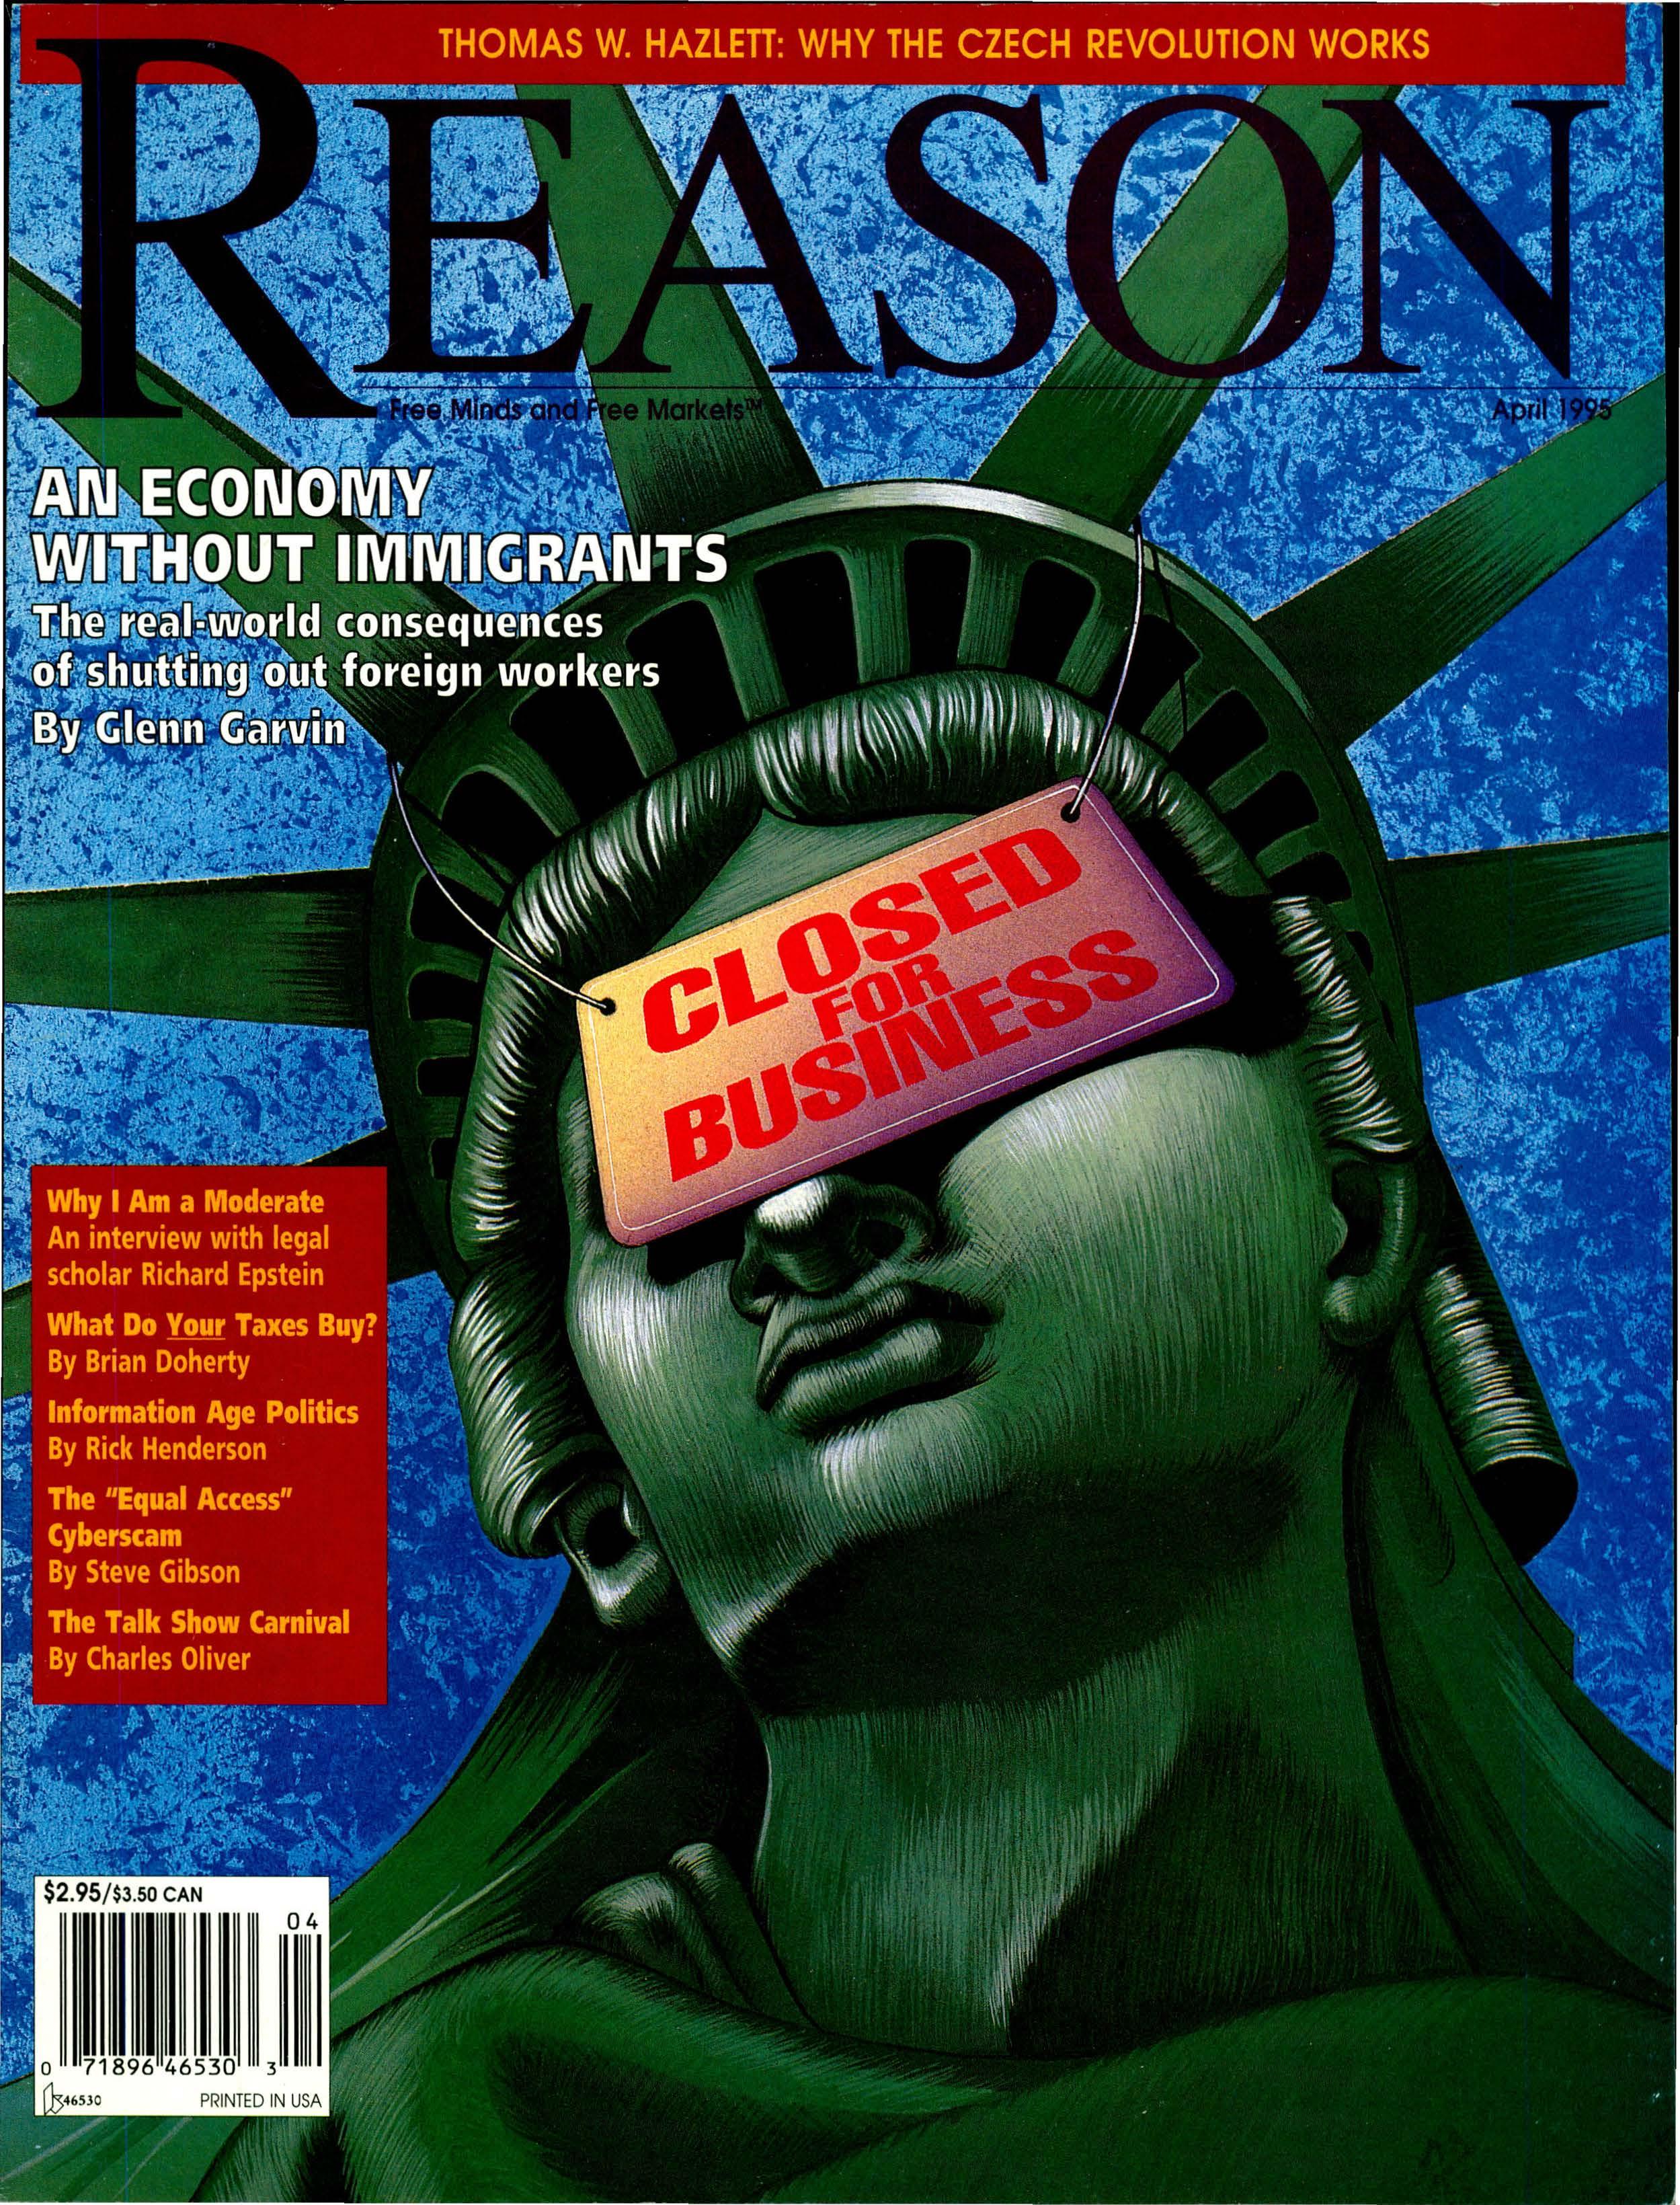 Reason Magazine, April 1995 cover image